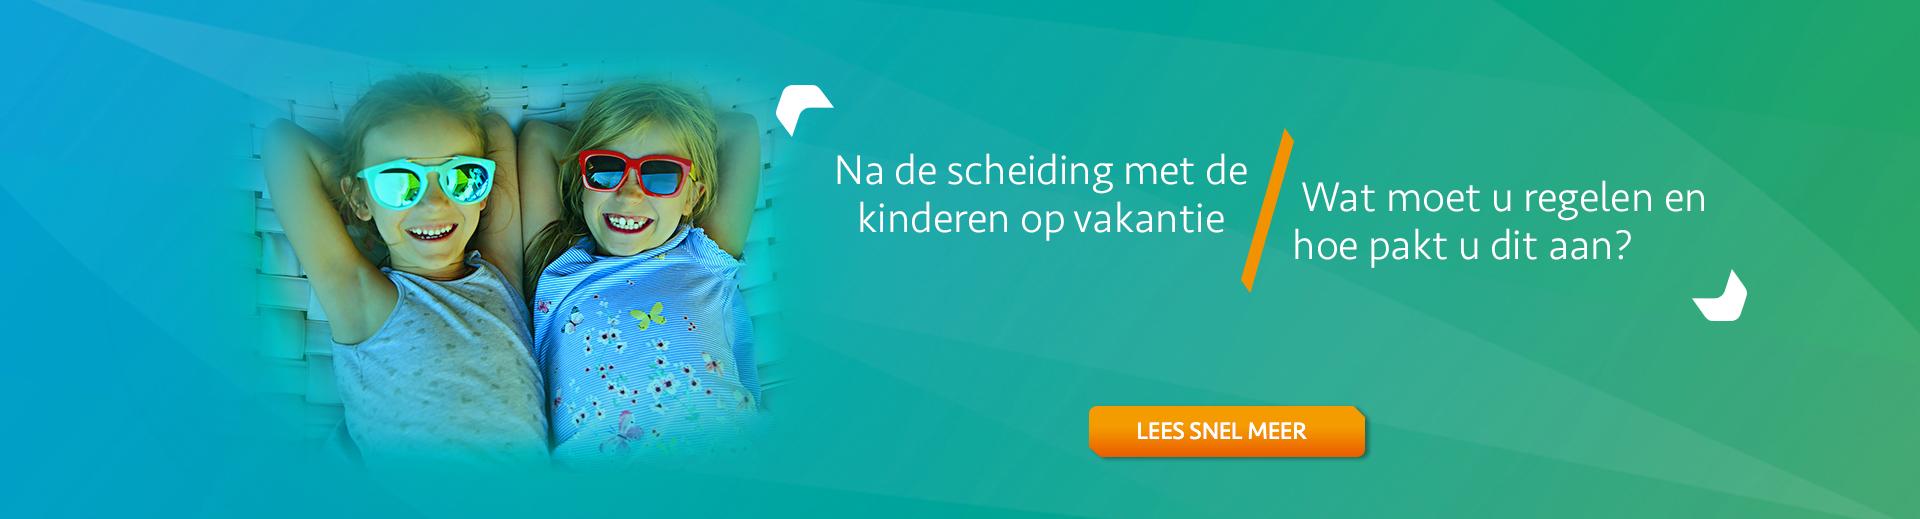 Op vakantie na scheiding - Scheidingsplanner Almelo - Deventer - Nijverdal